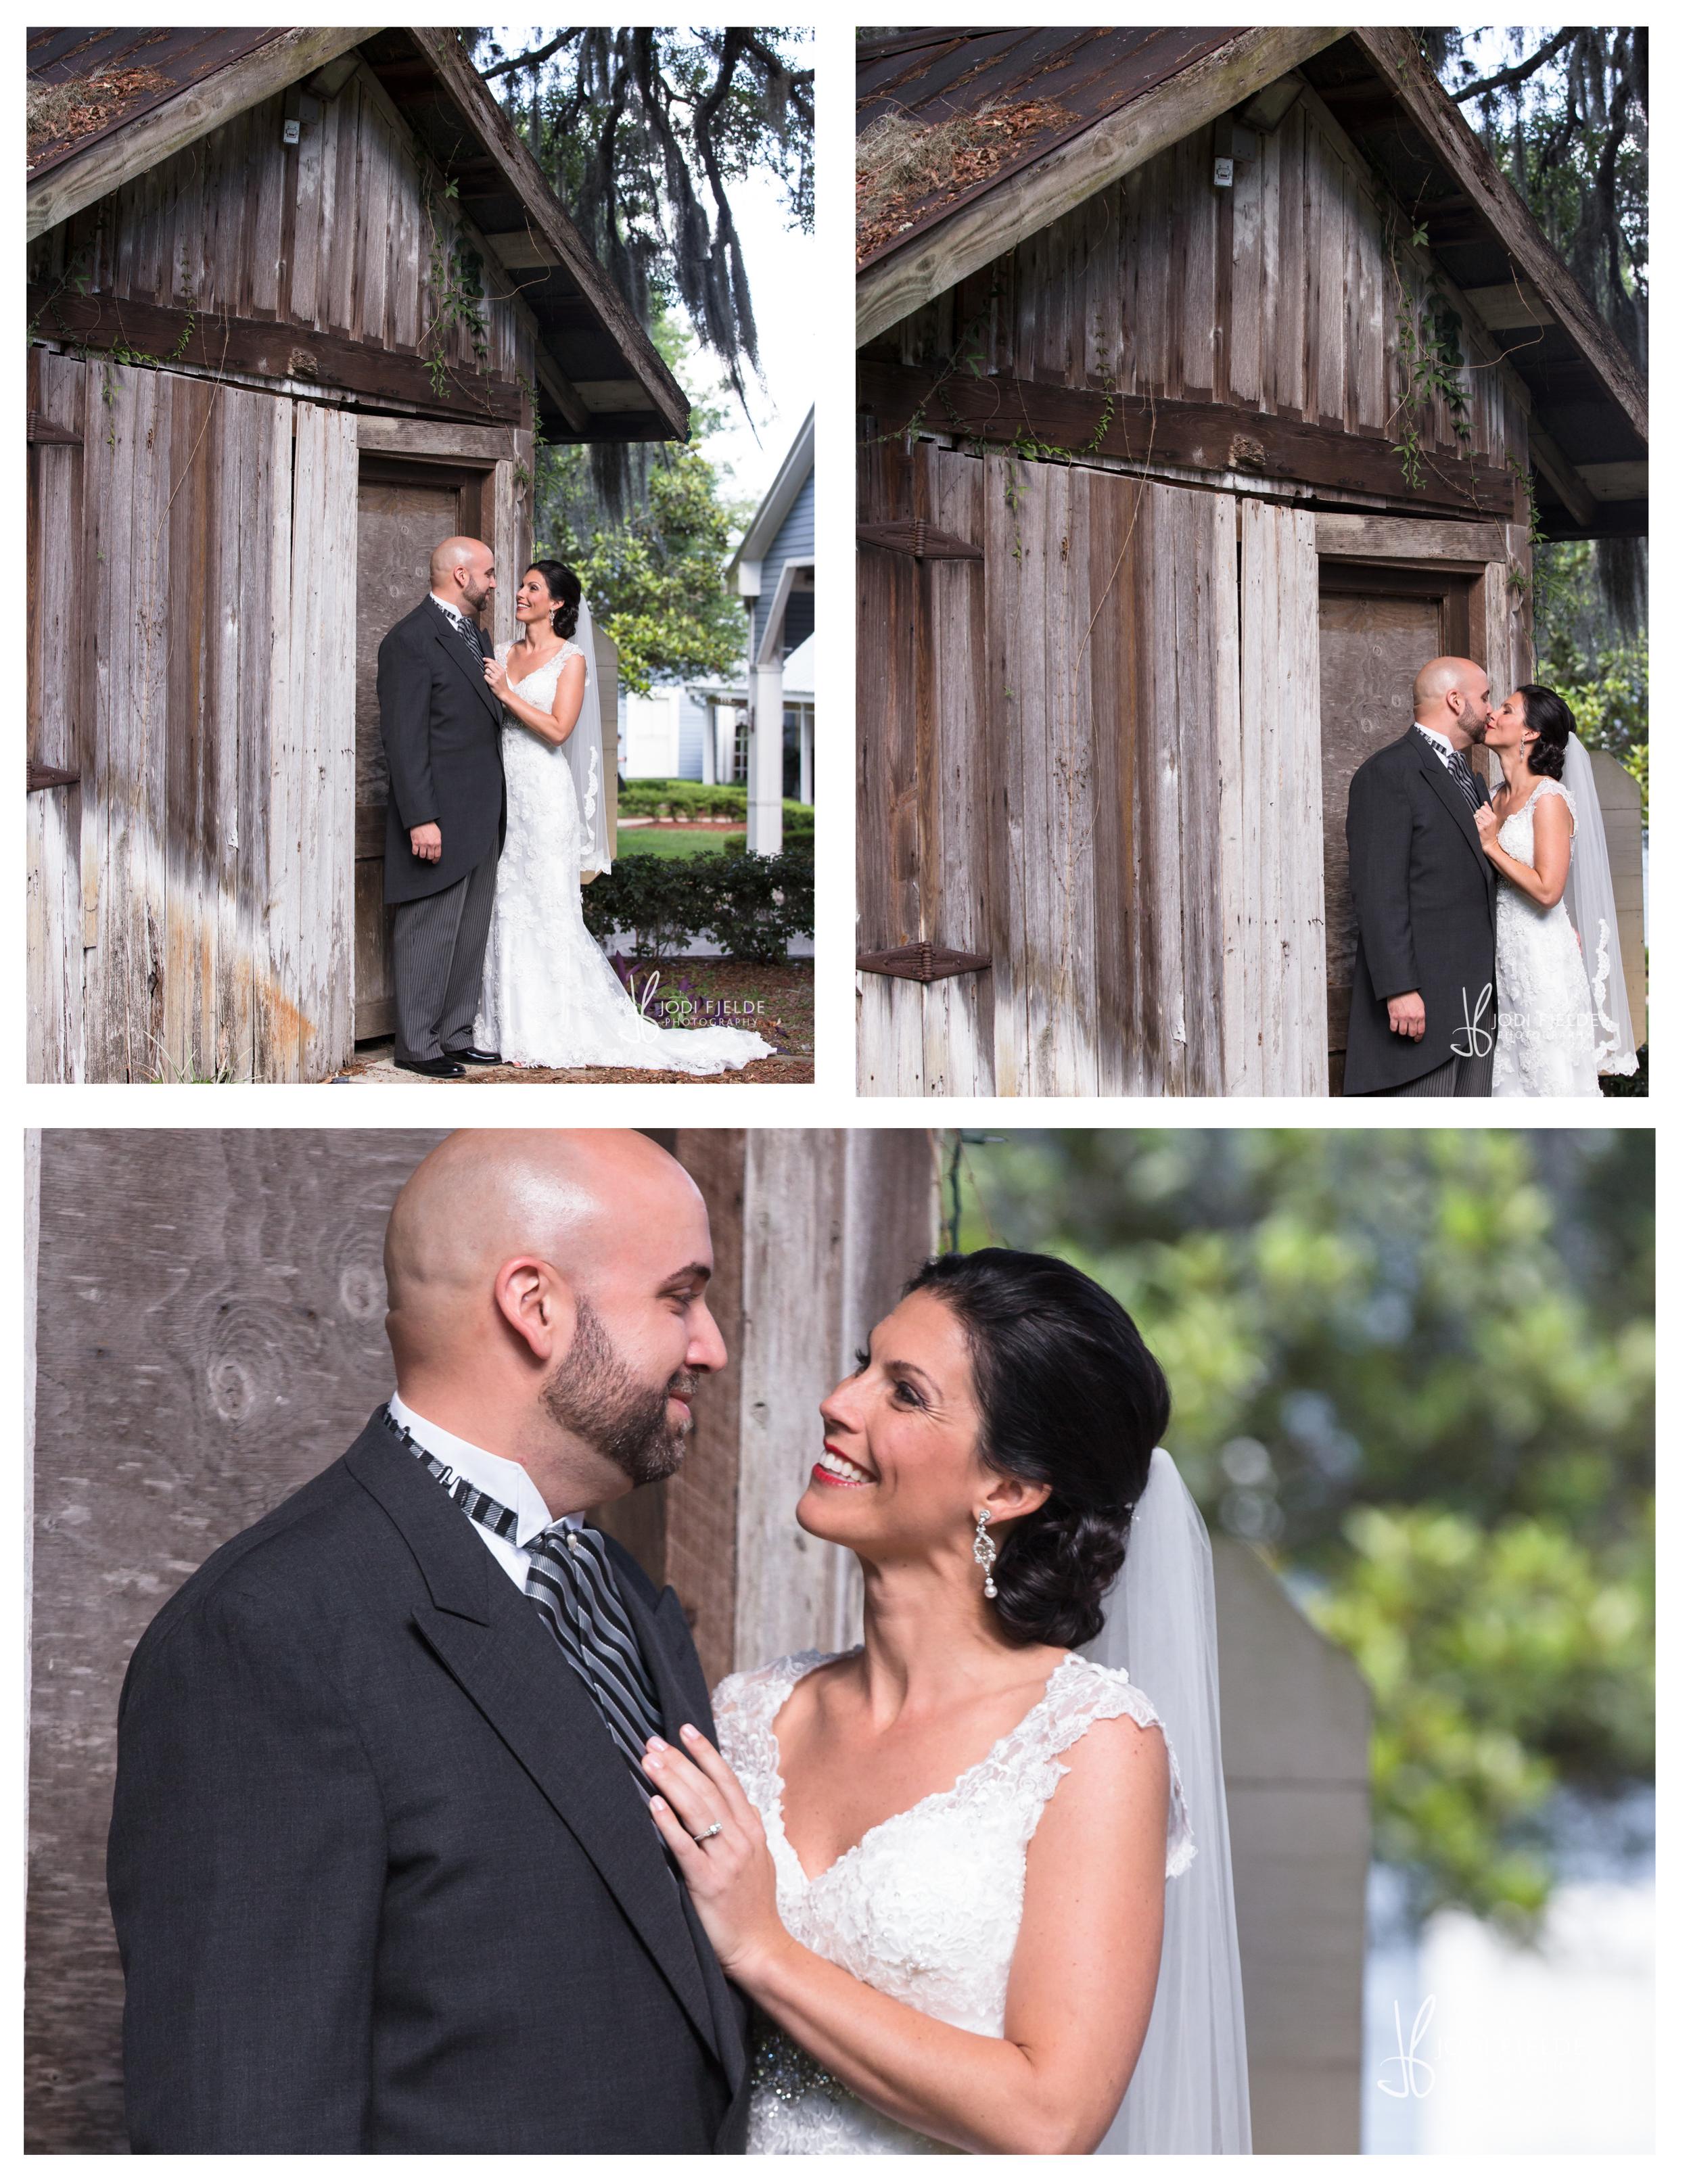 Highland_Manor_Apopka_Florida_wedding_Jackie_&_Tim_photography_jodi_Fjelde_photography-11.jpg